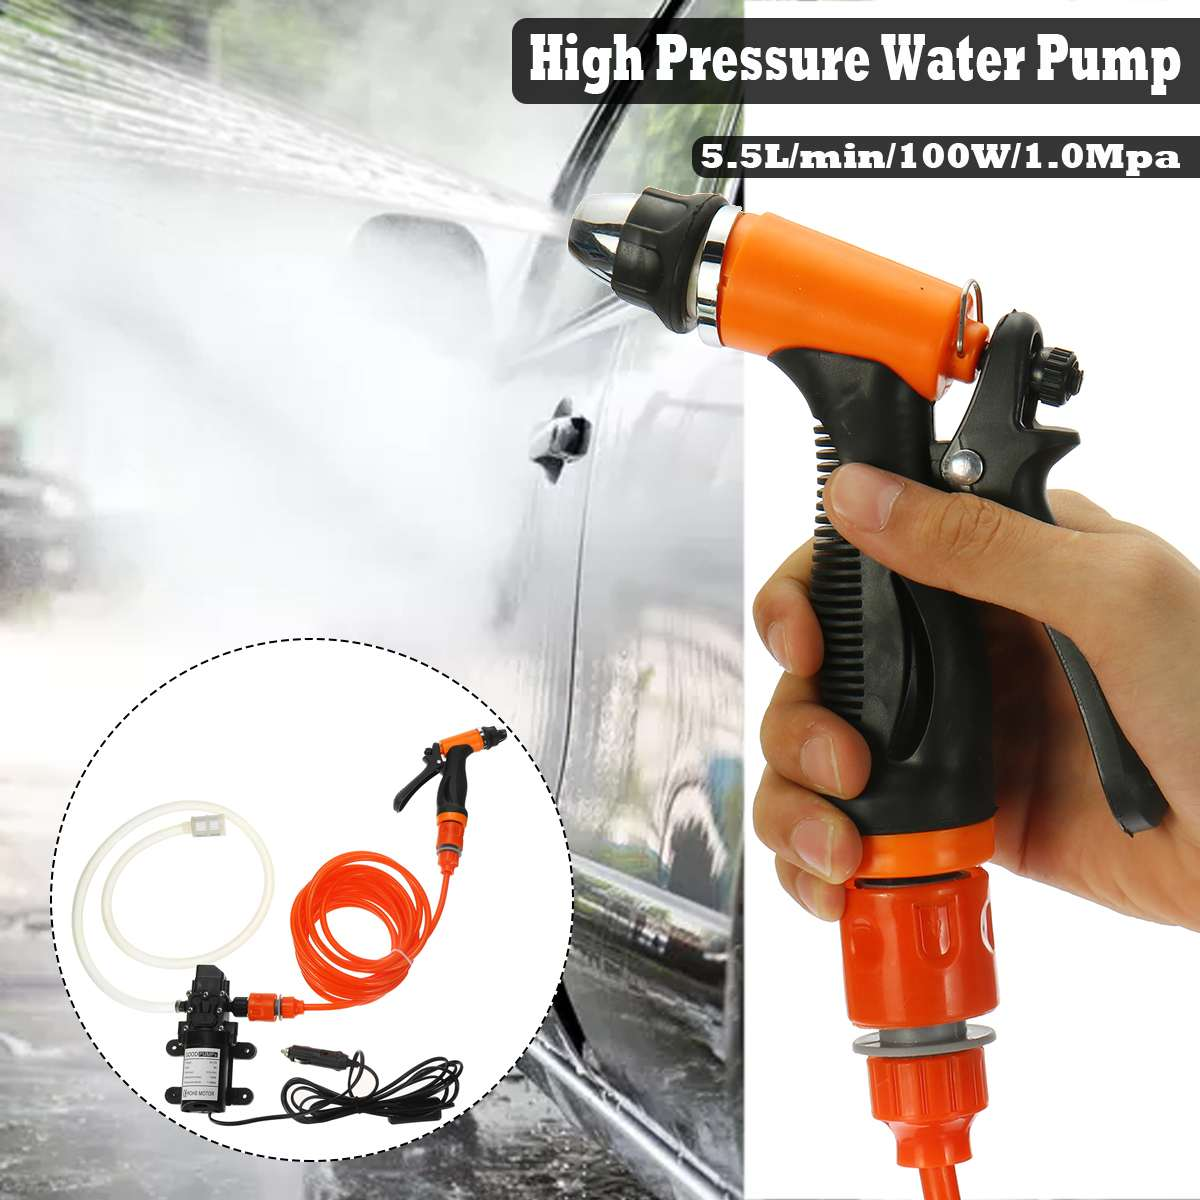 DC 12V Electric Water Pump High Pressure Diaphragm Self Priming Water Pump Sprayer Car Wash 12 V